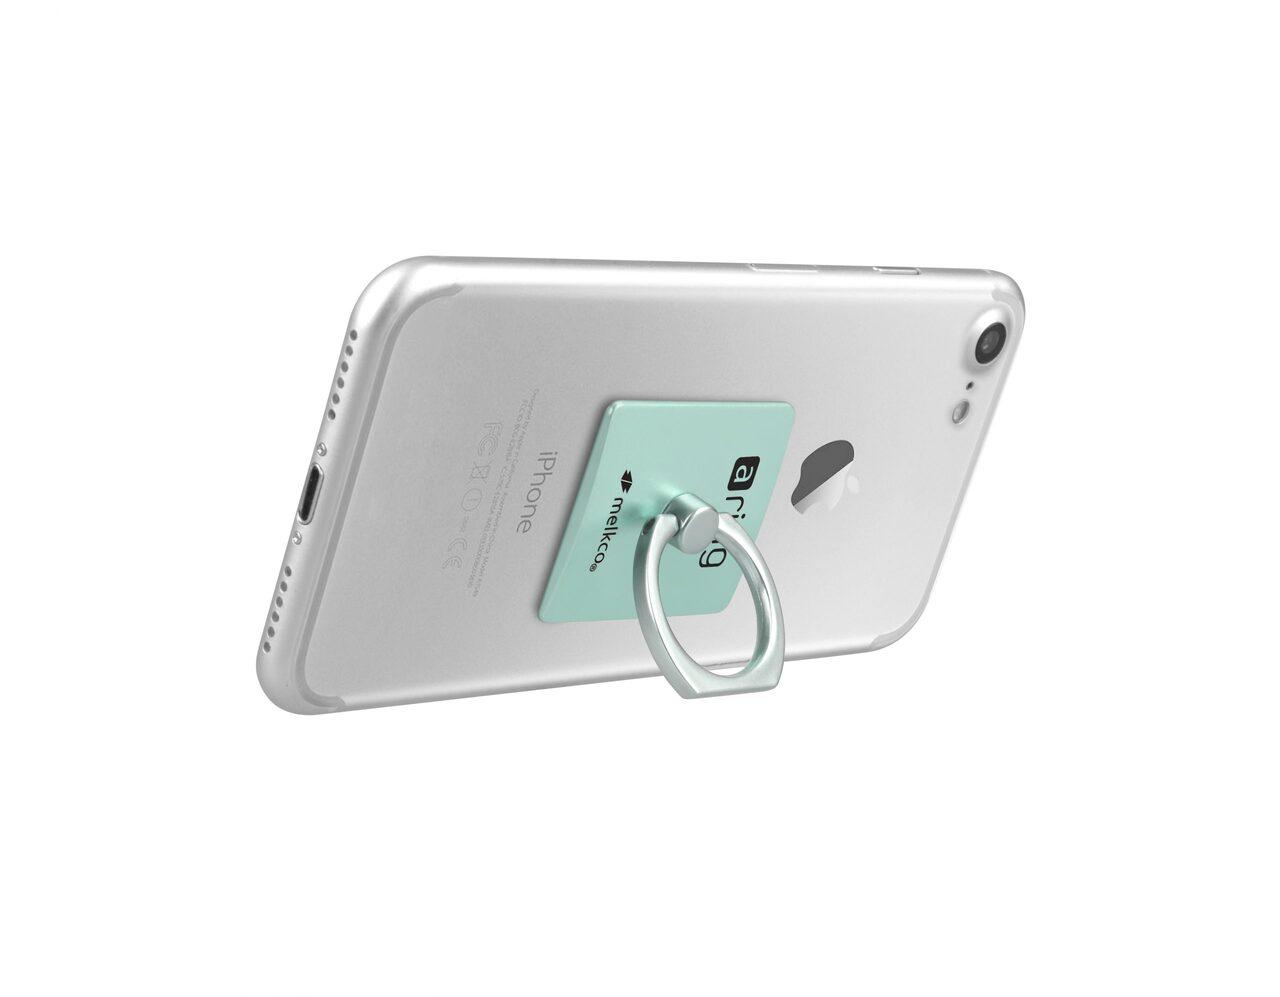 Melkco aring Universal Grip (Stand Smartphone Holder) - (Tiffany Blue)